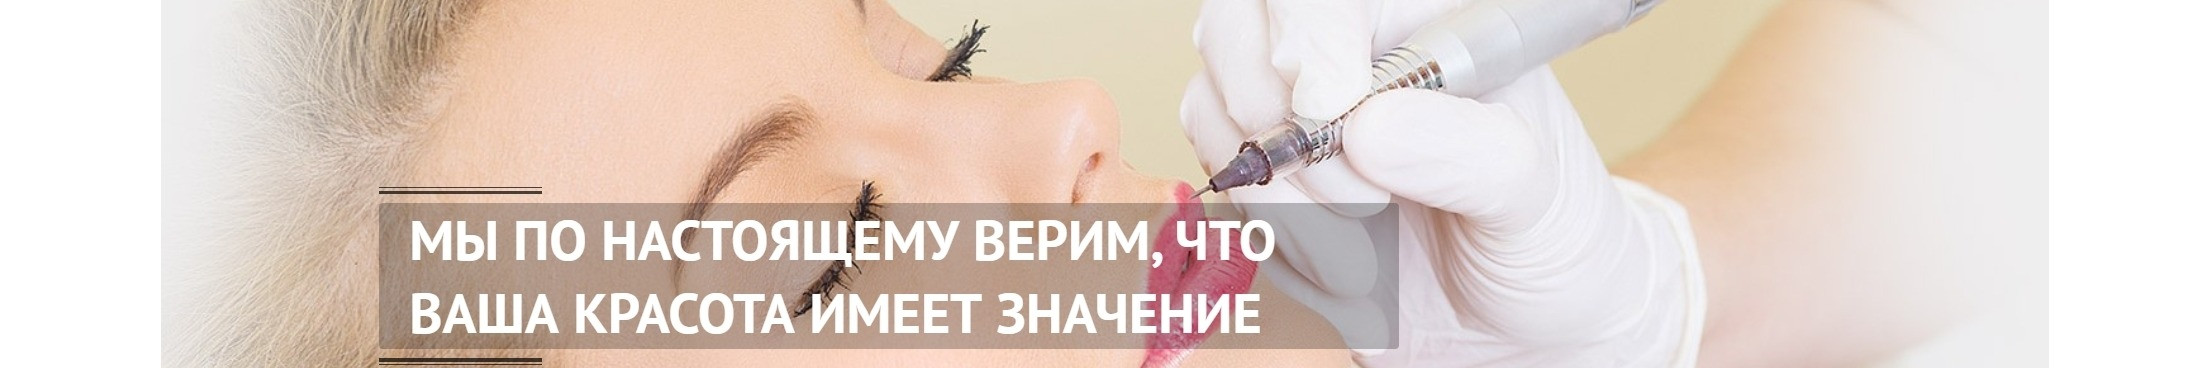 Услуги Красоты Clinica Zhanna Martel